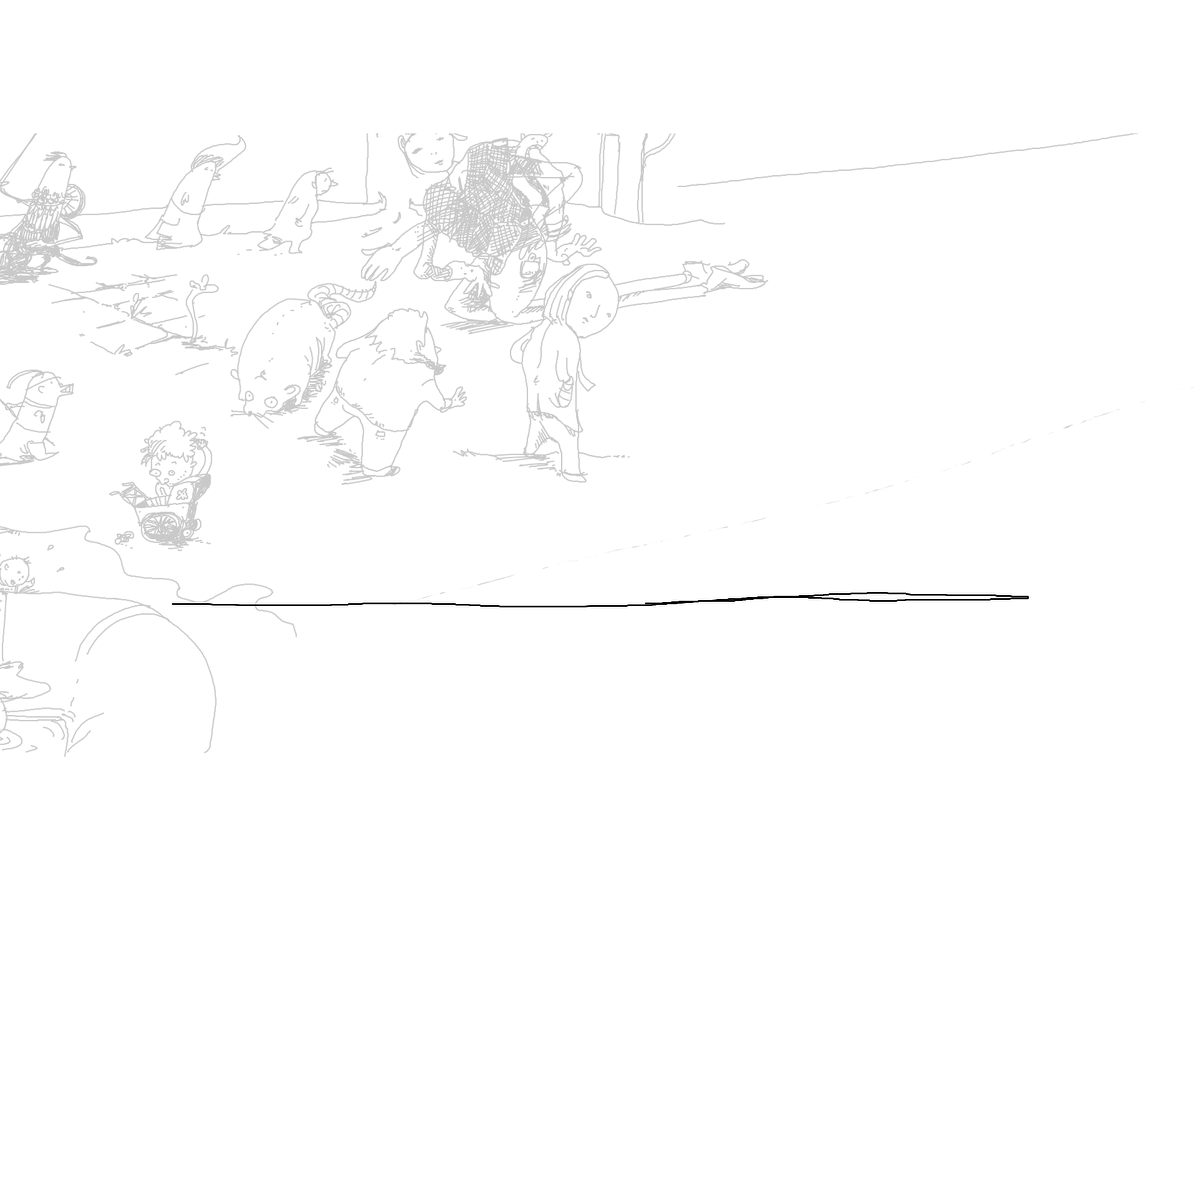 BAAAM drawing#4981 lat:78.7422409057617200lng: -18.1122398376464840